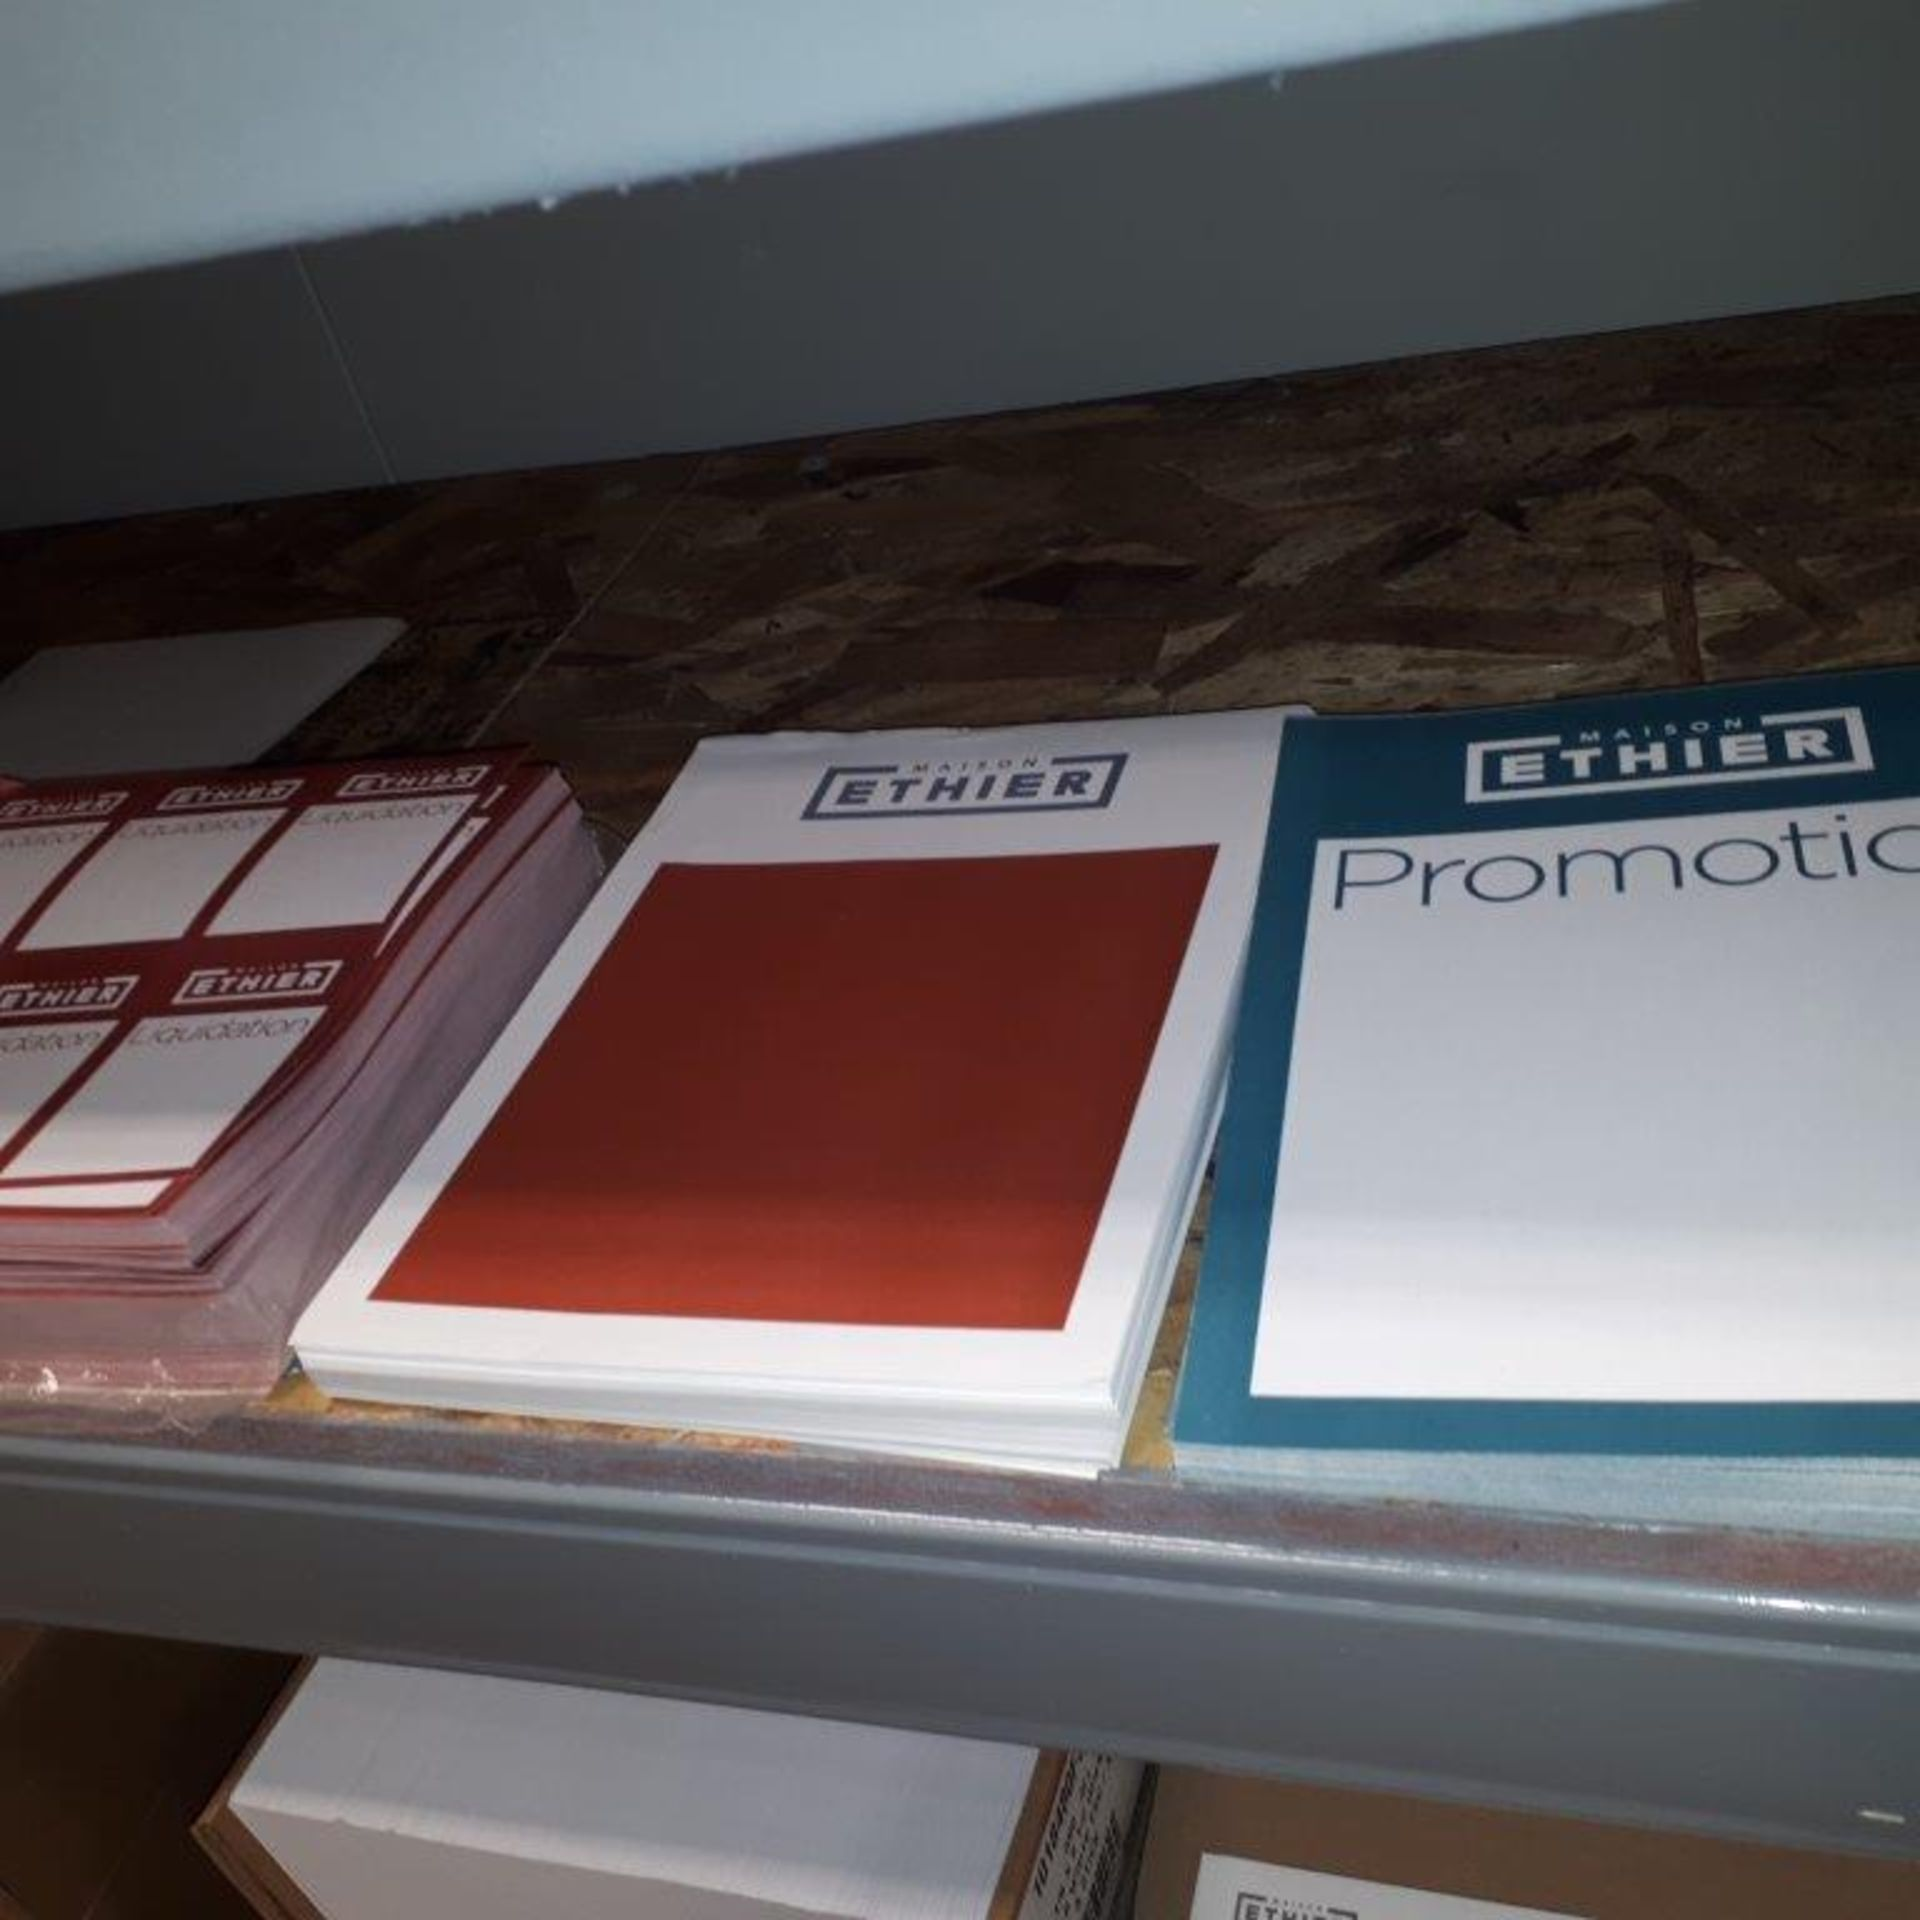 Lot 99 - Assorted labels,binders,etc... (Lot)